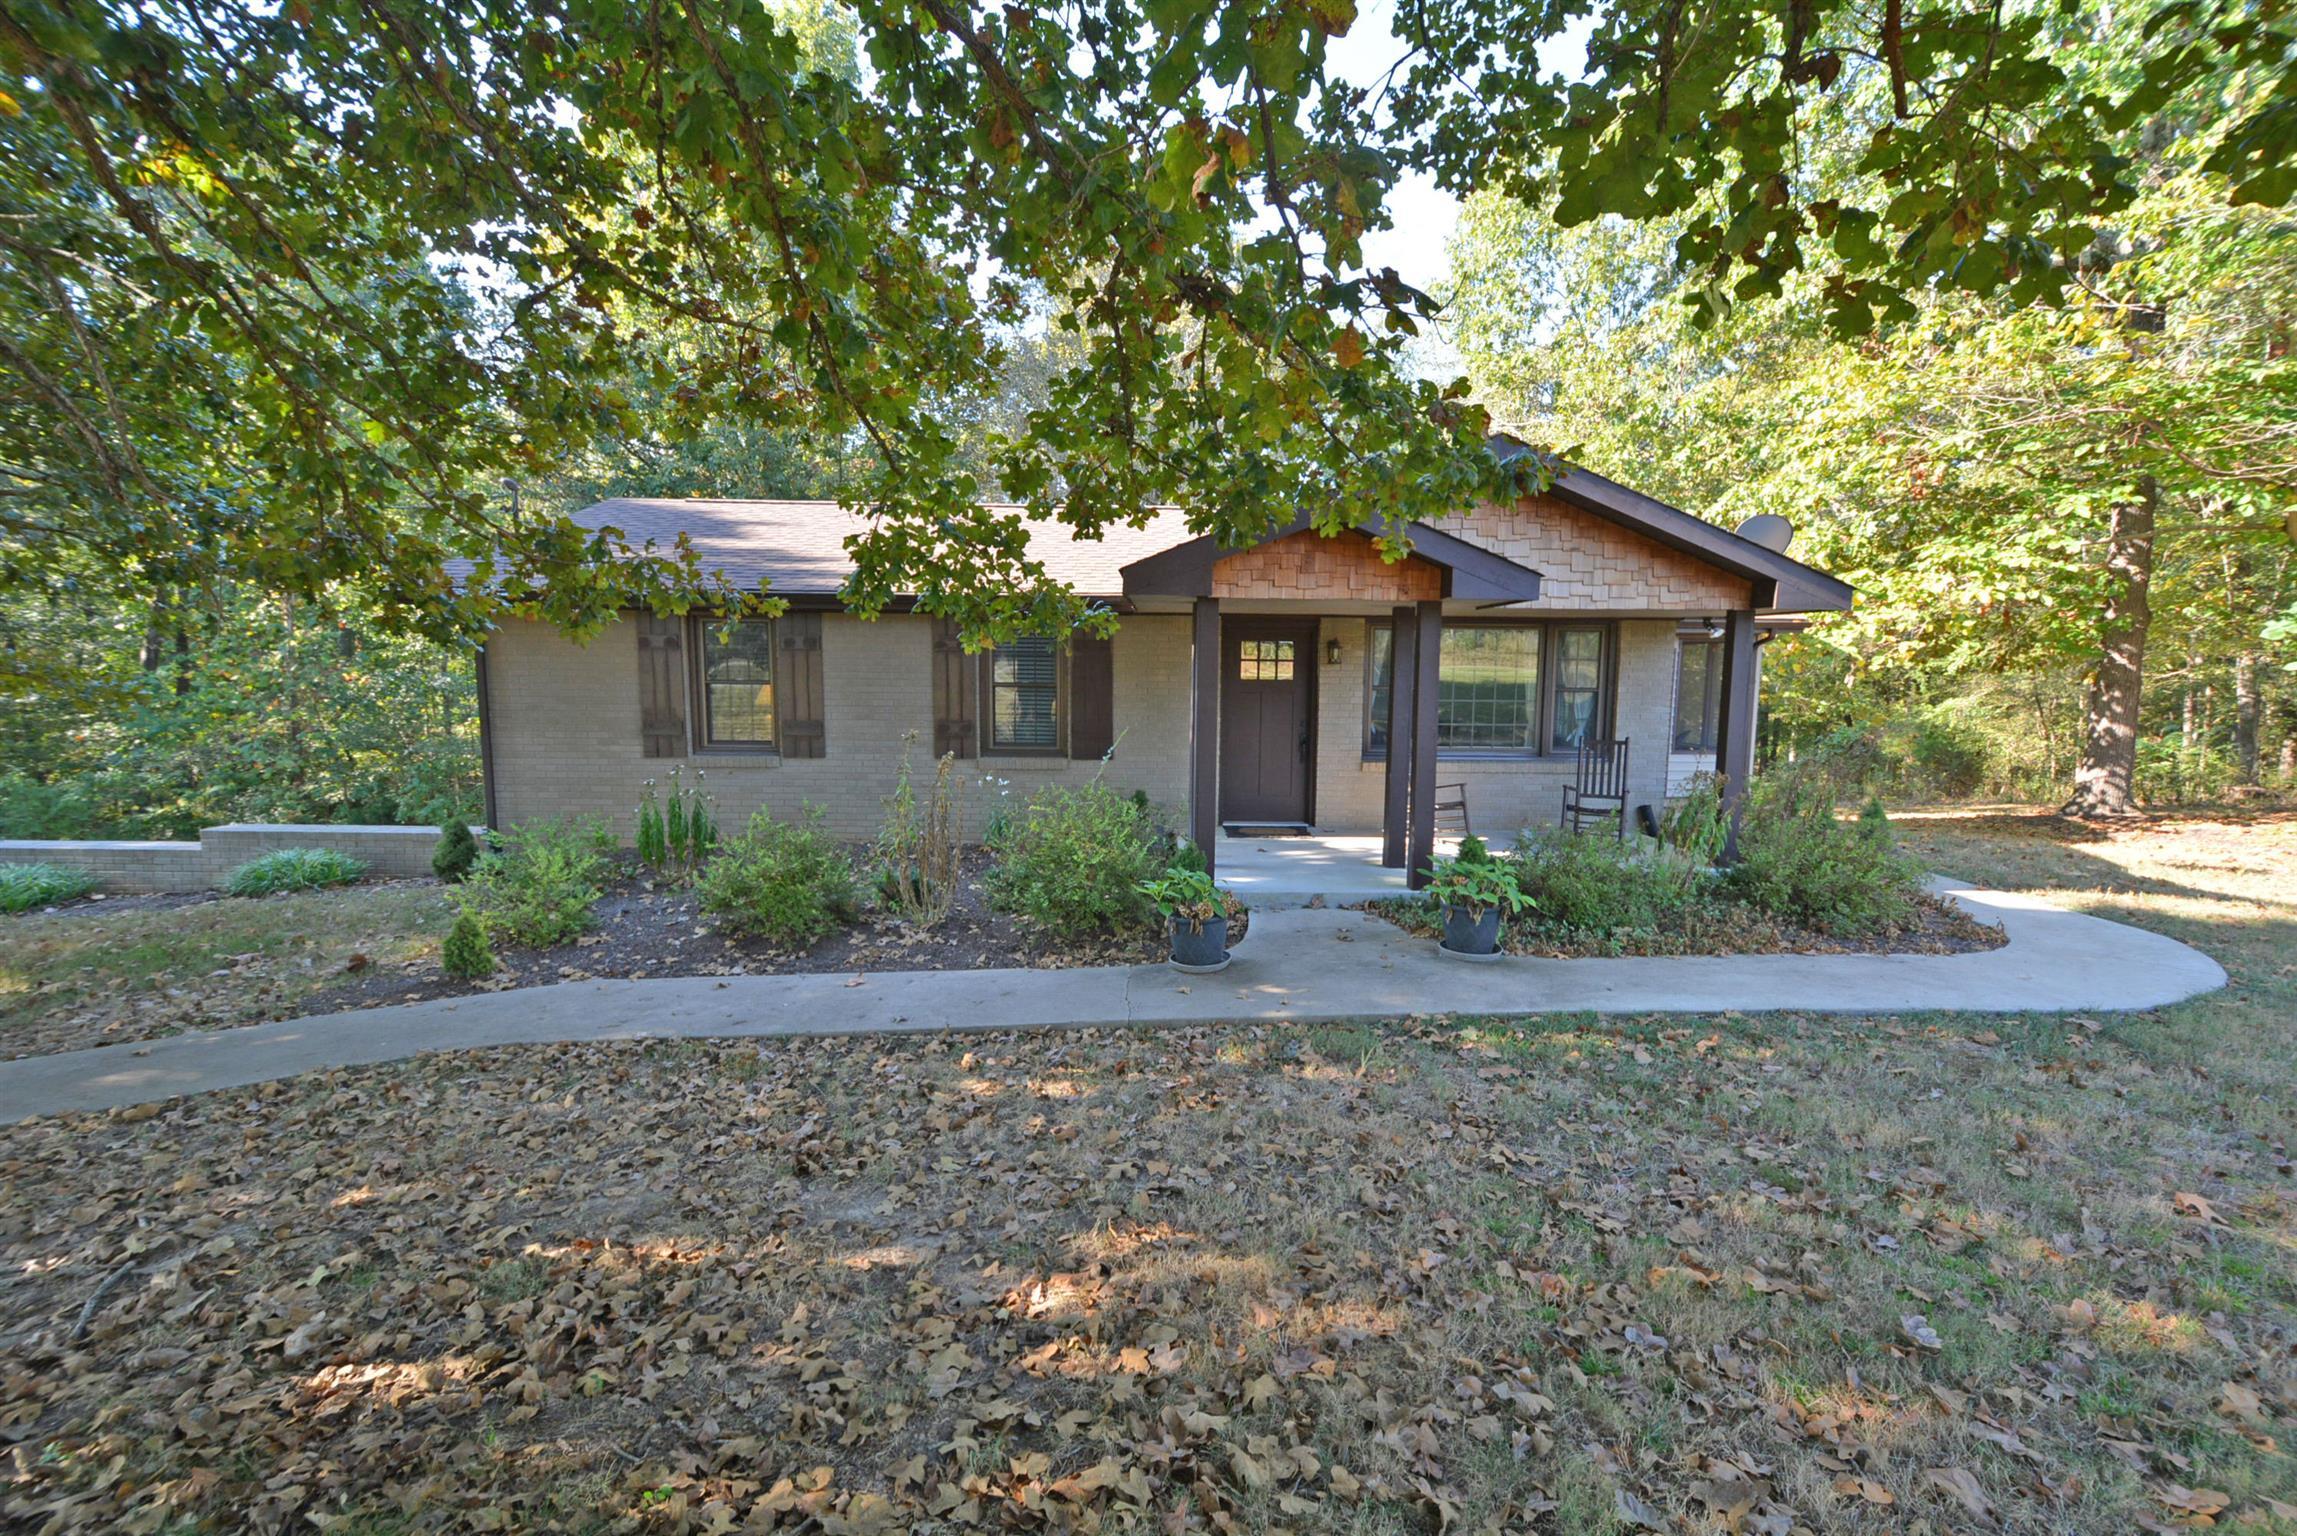 1340 Southside Rd, Southside, TN 37171 - Southside, TN real estate listing